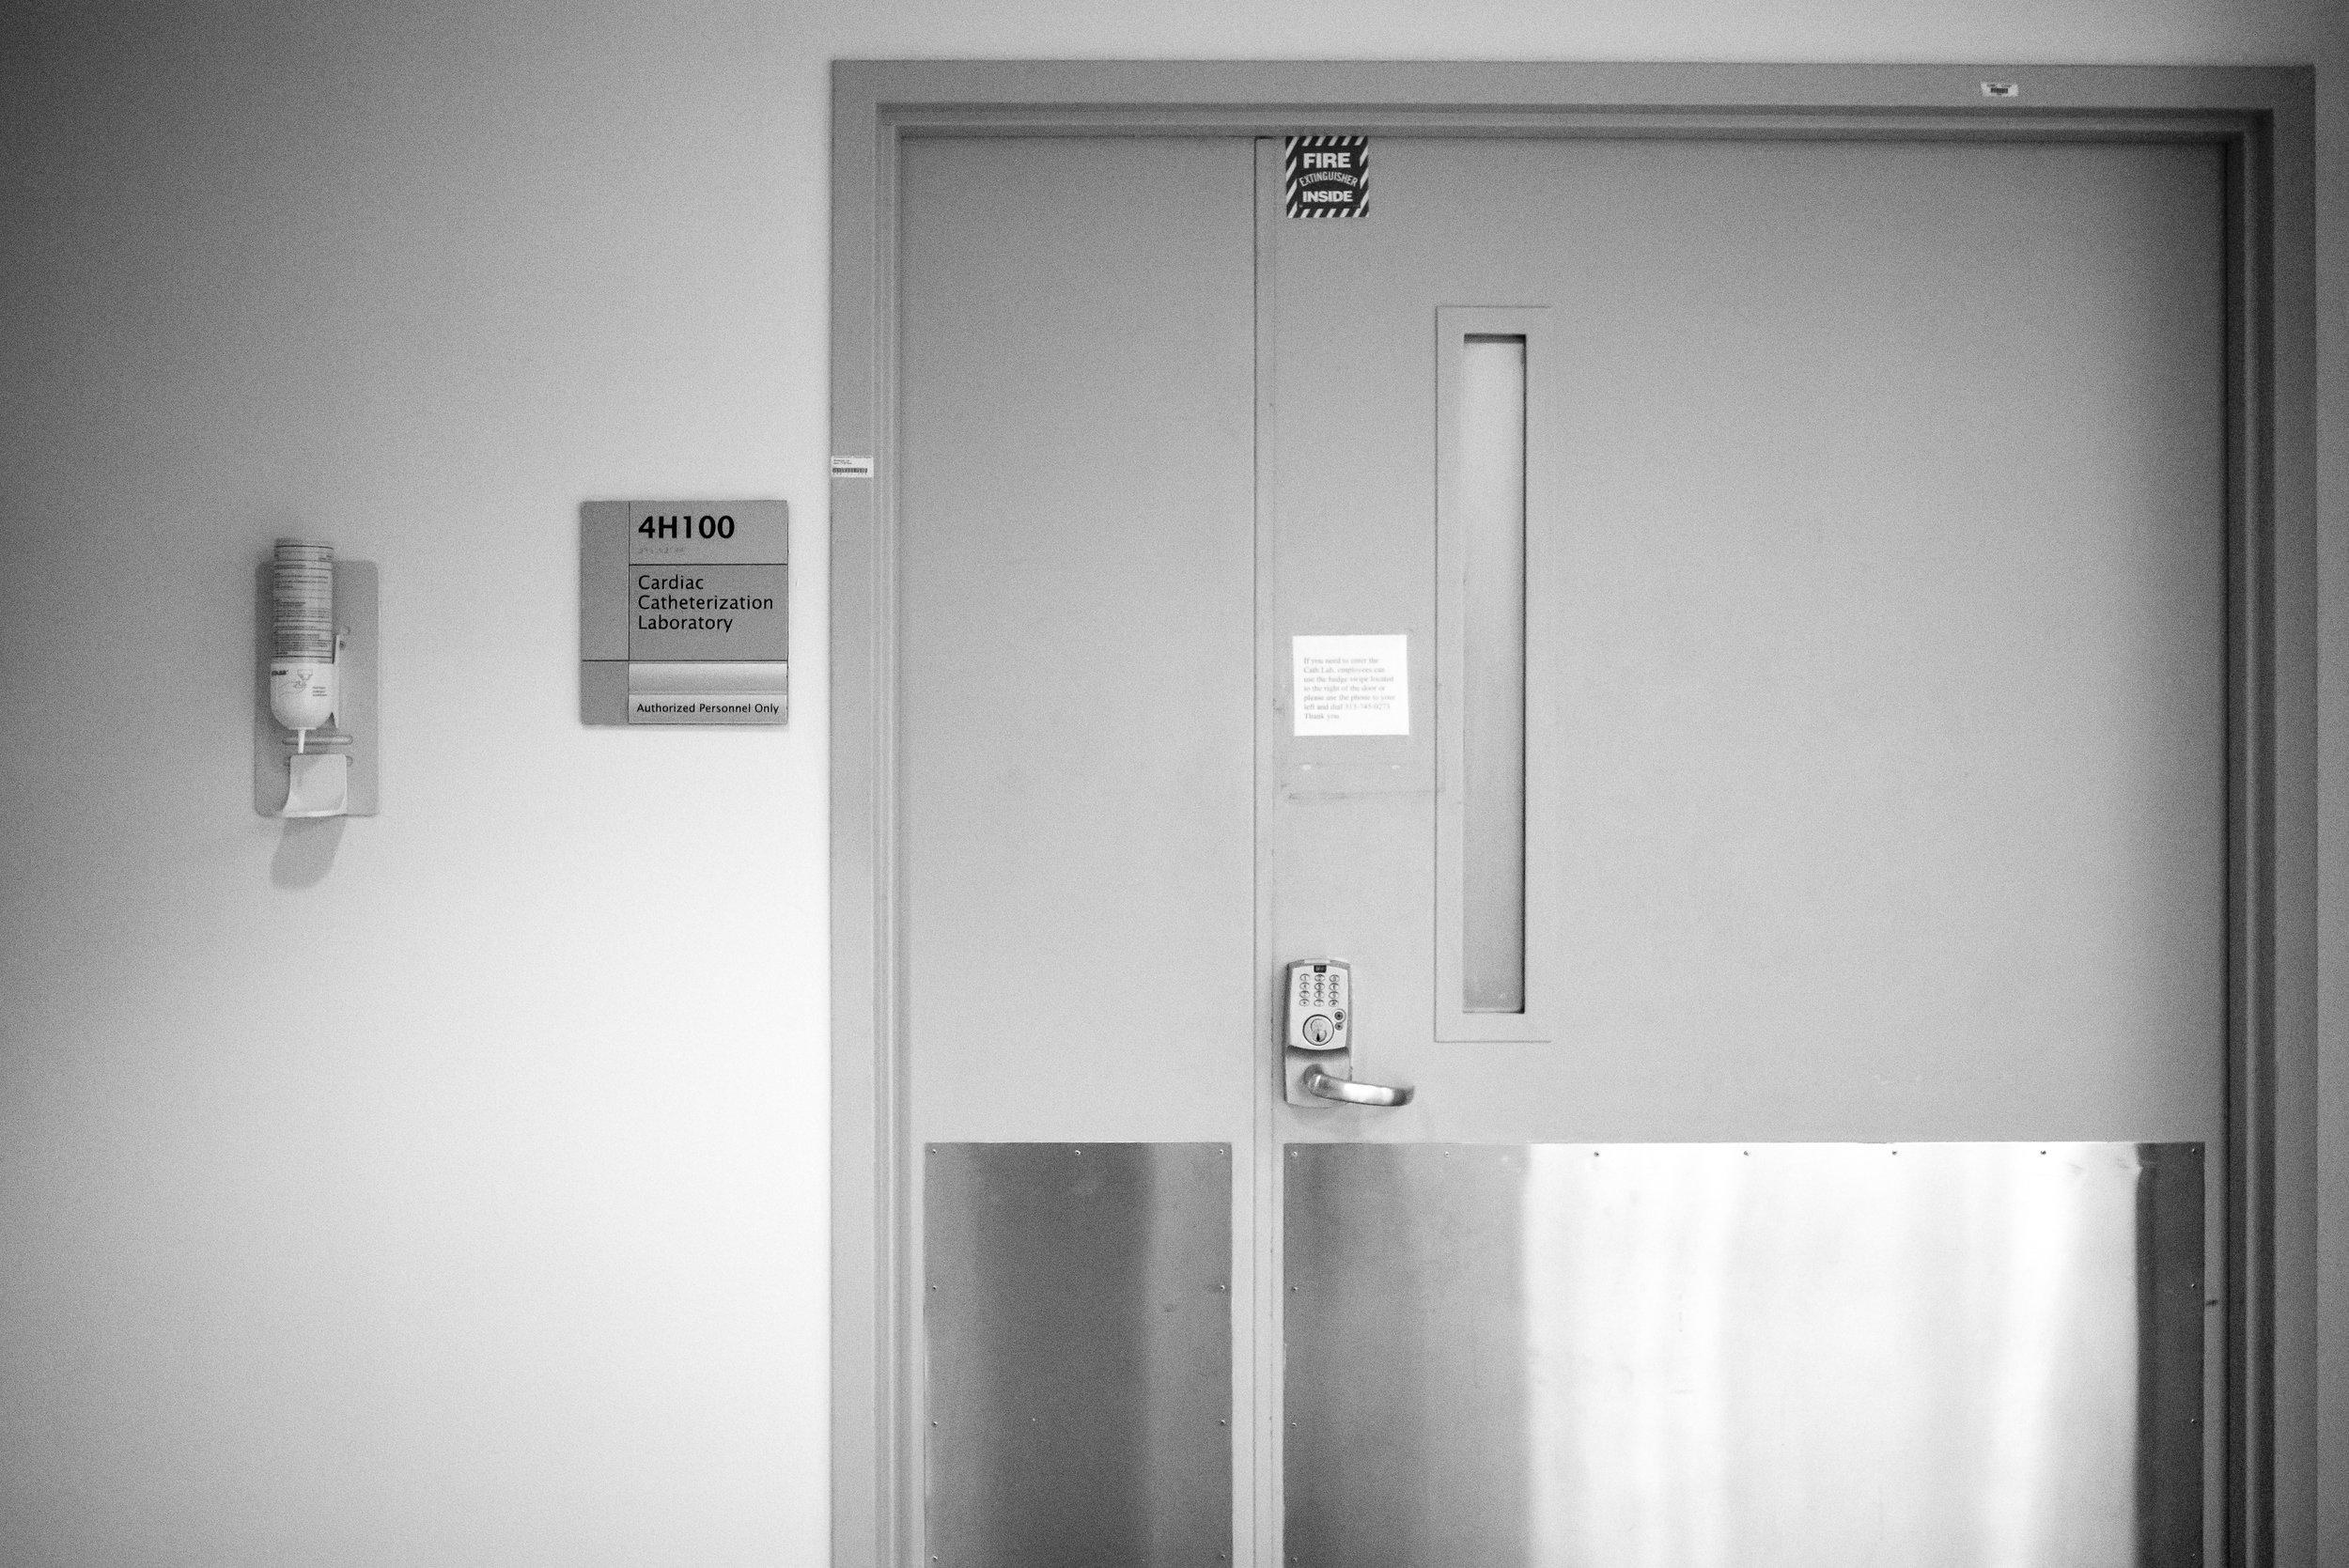 Cath lab entrance at children's hospital